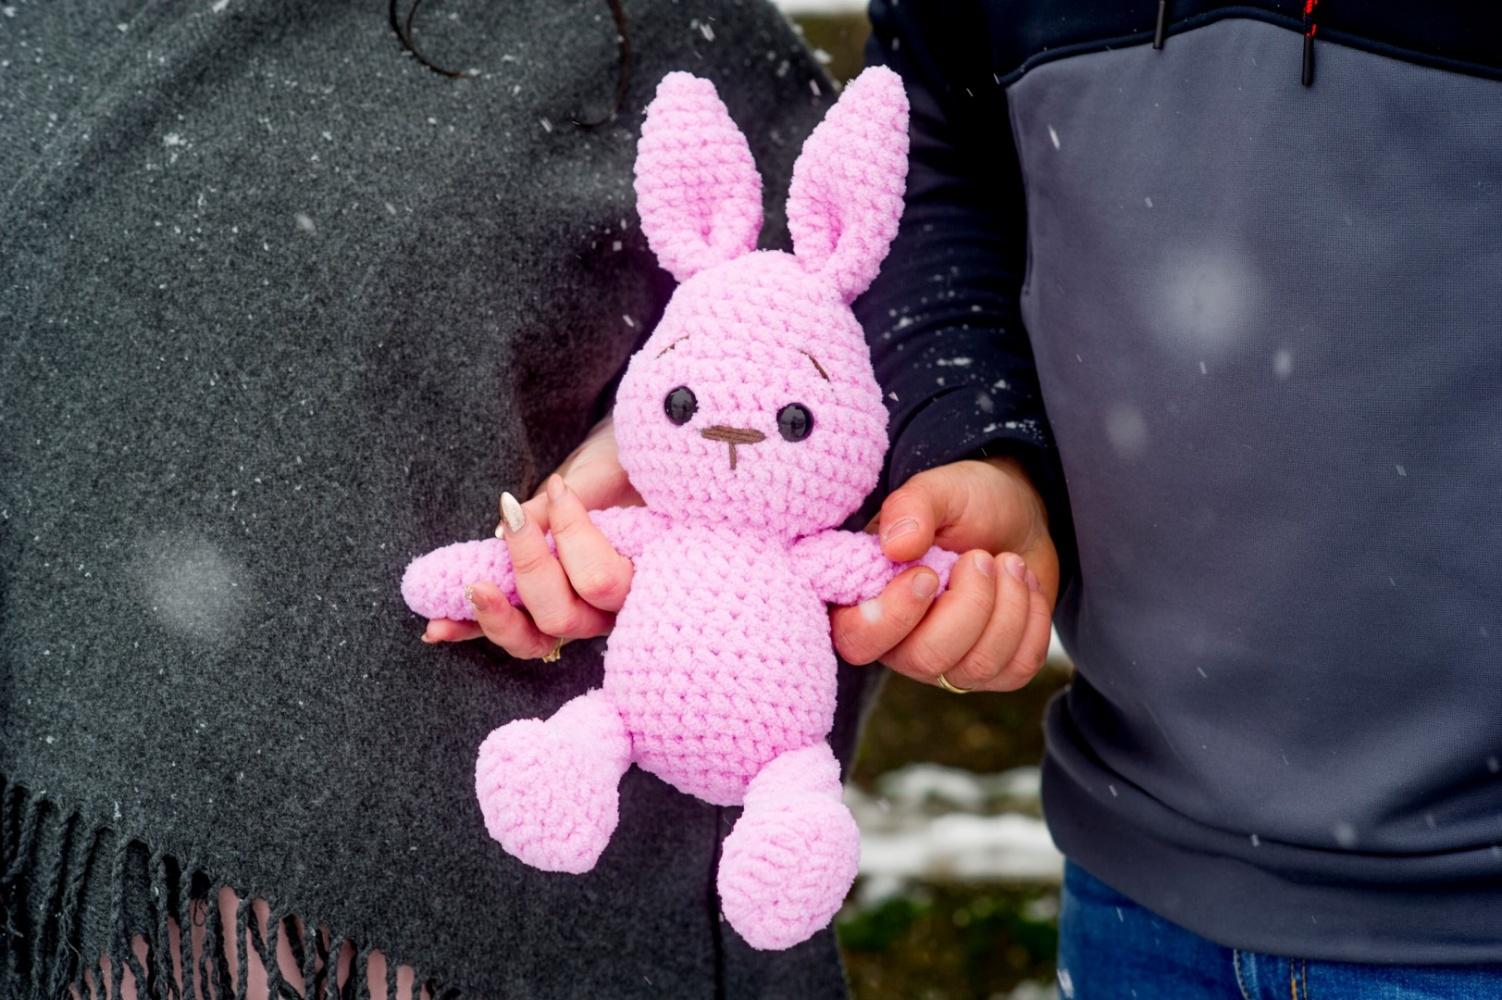 http://www.fotoz.sk/images/gallery-47/normal/teli-kismama-fotozas_kismama-fotok_winter-pregnacy-photo_fotenie-tehuliek_winter-maternity-foto_teli-kismama_tehulka_tehulka-foto_zimne-fotenie_kreativ-kismama-fotozas_046.jpg